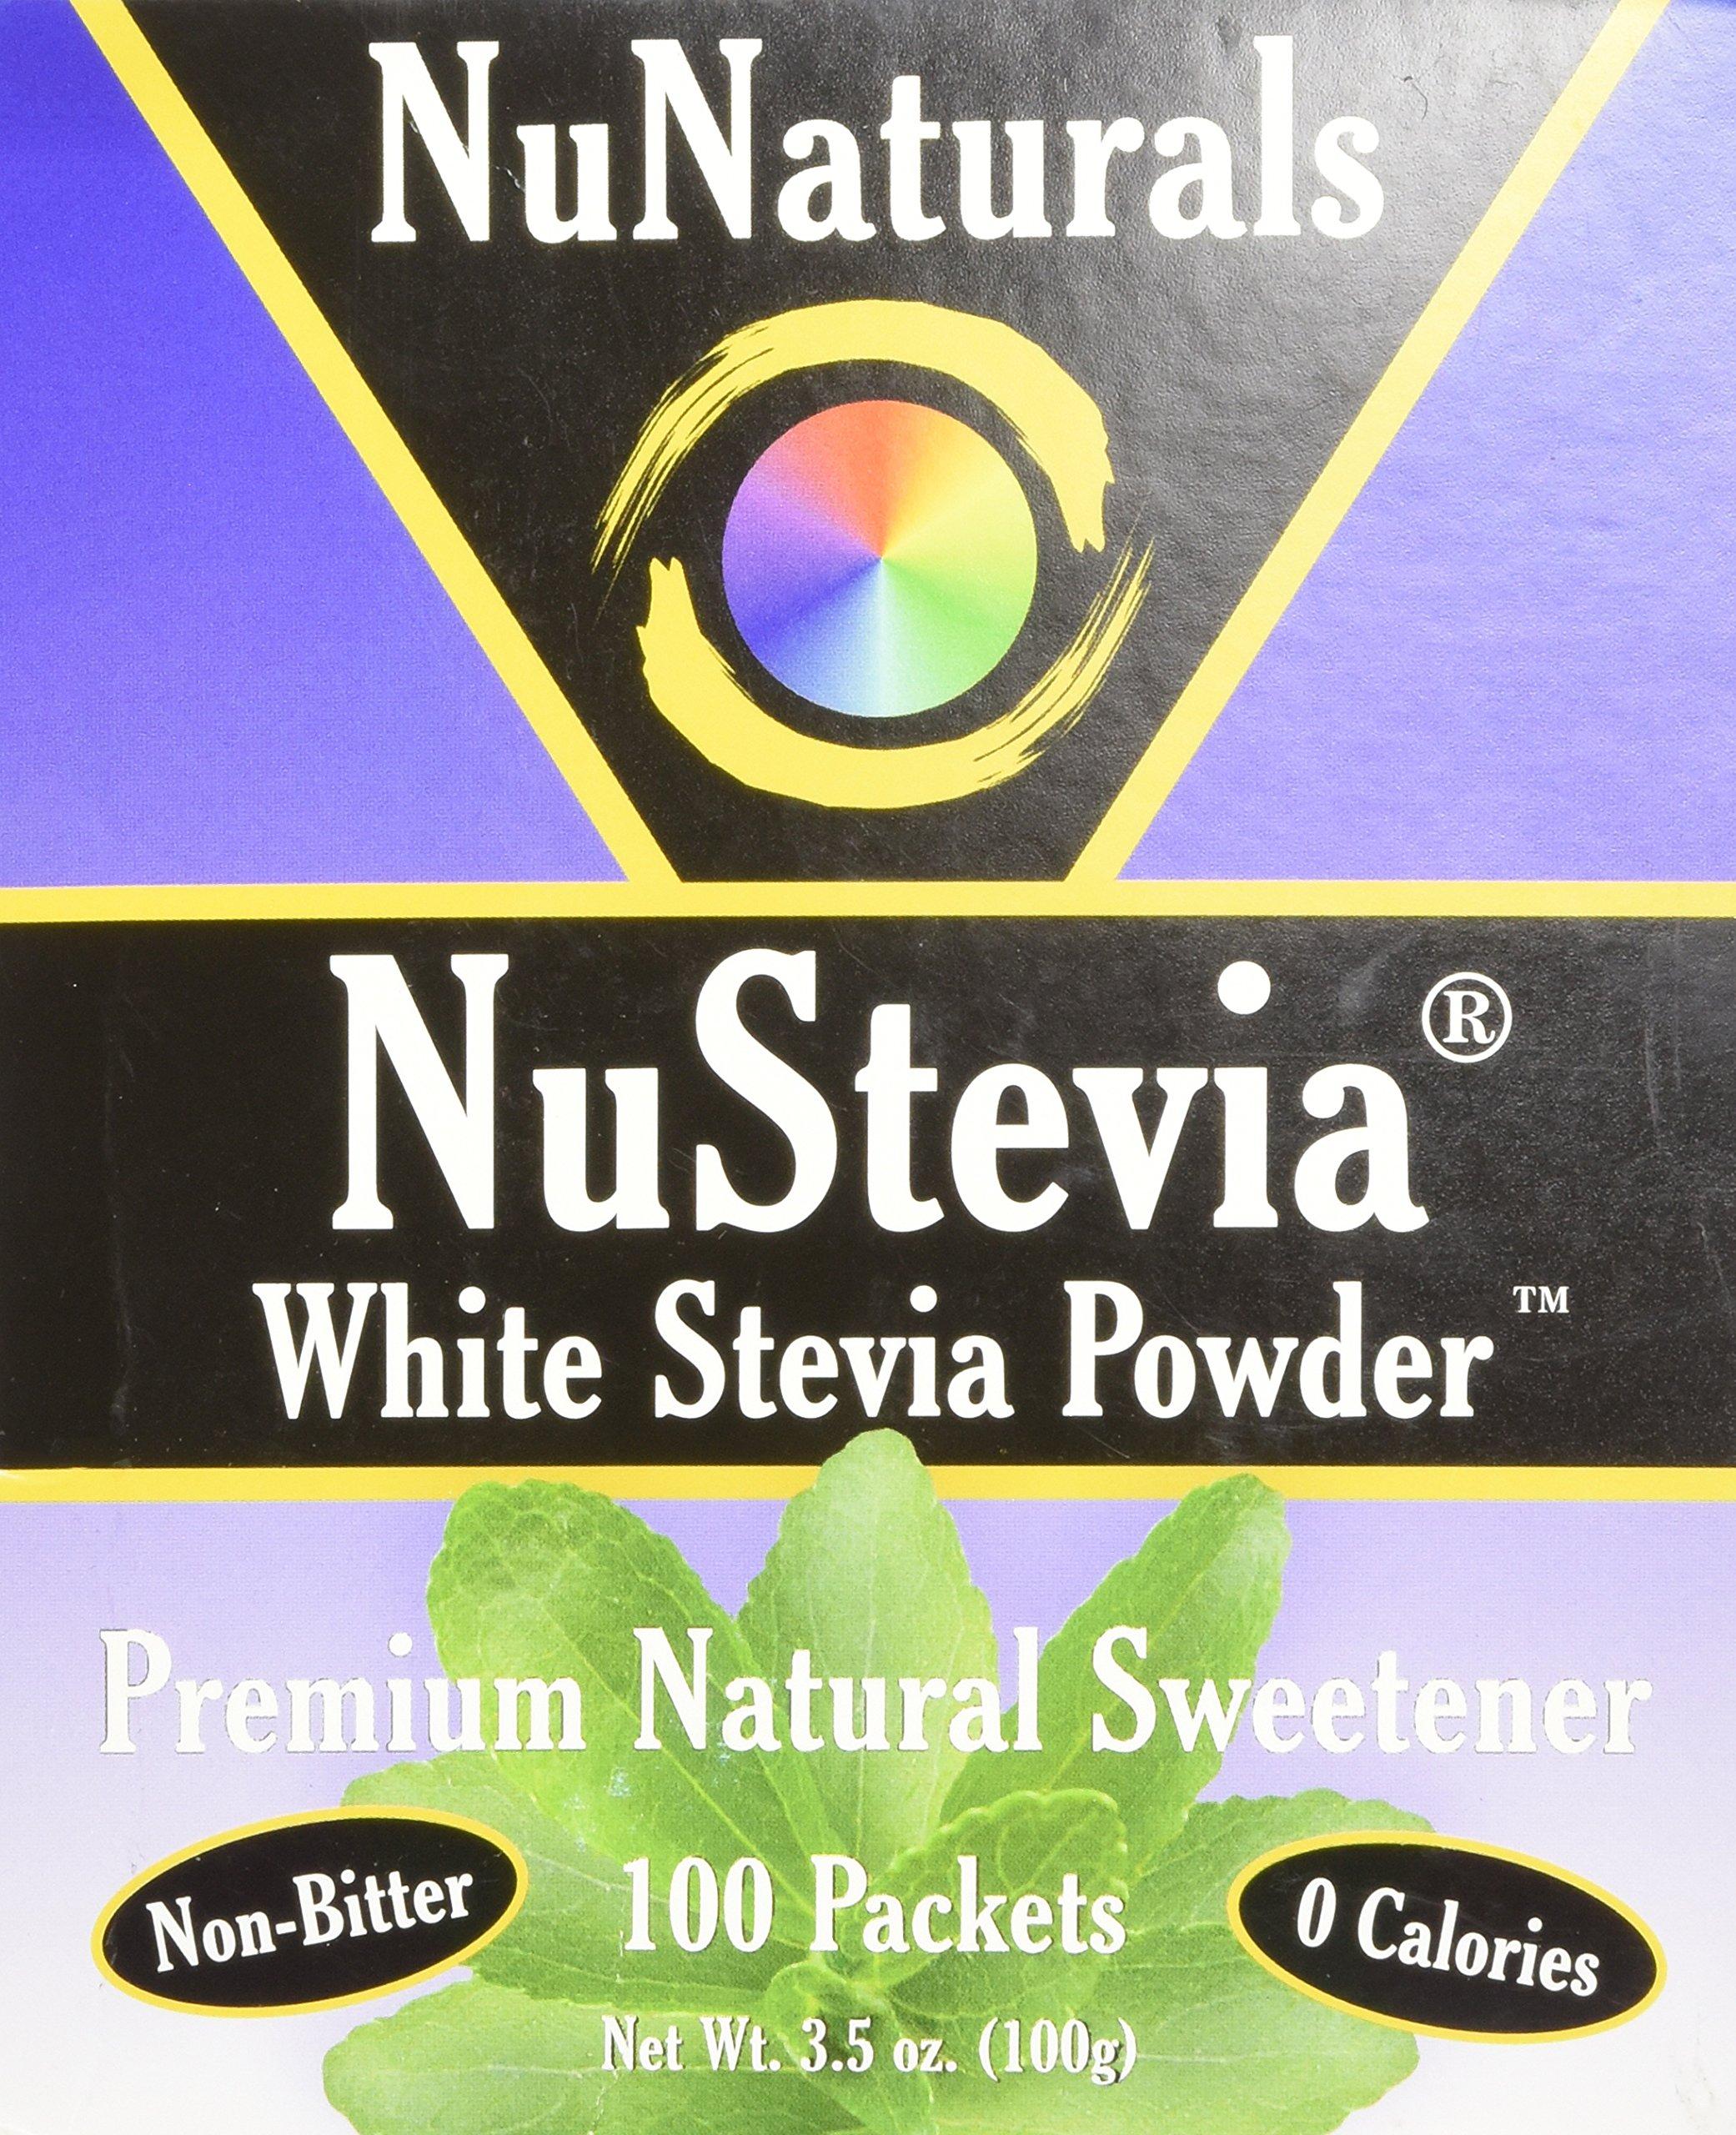 NuNaturals NuStevia White Stevia Powder